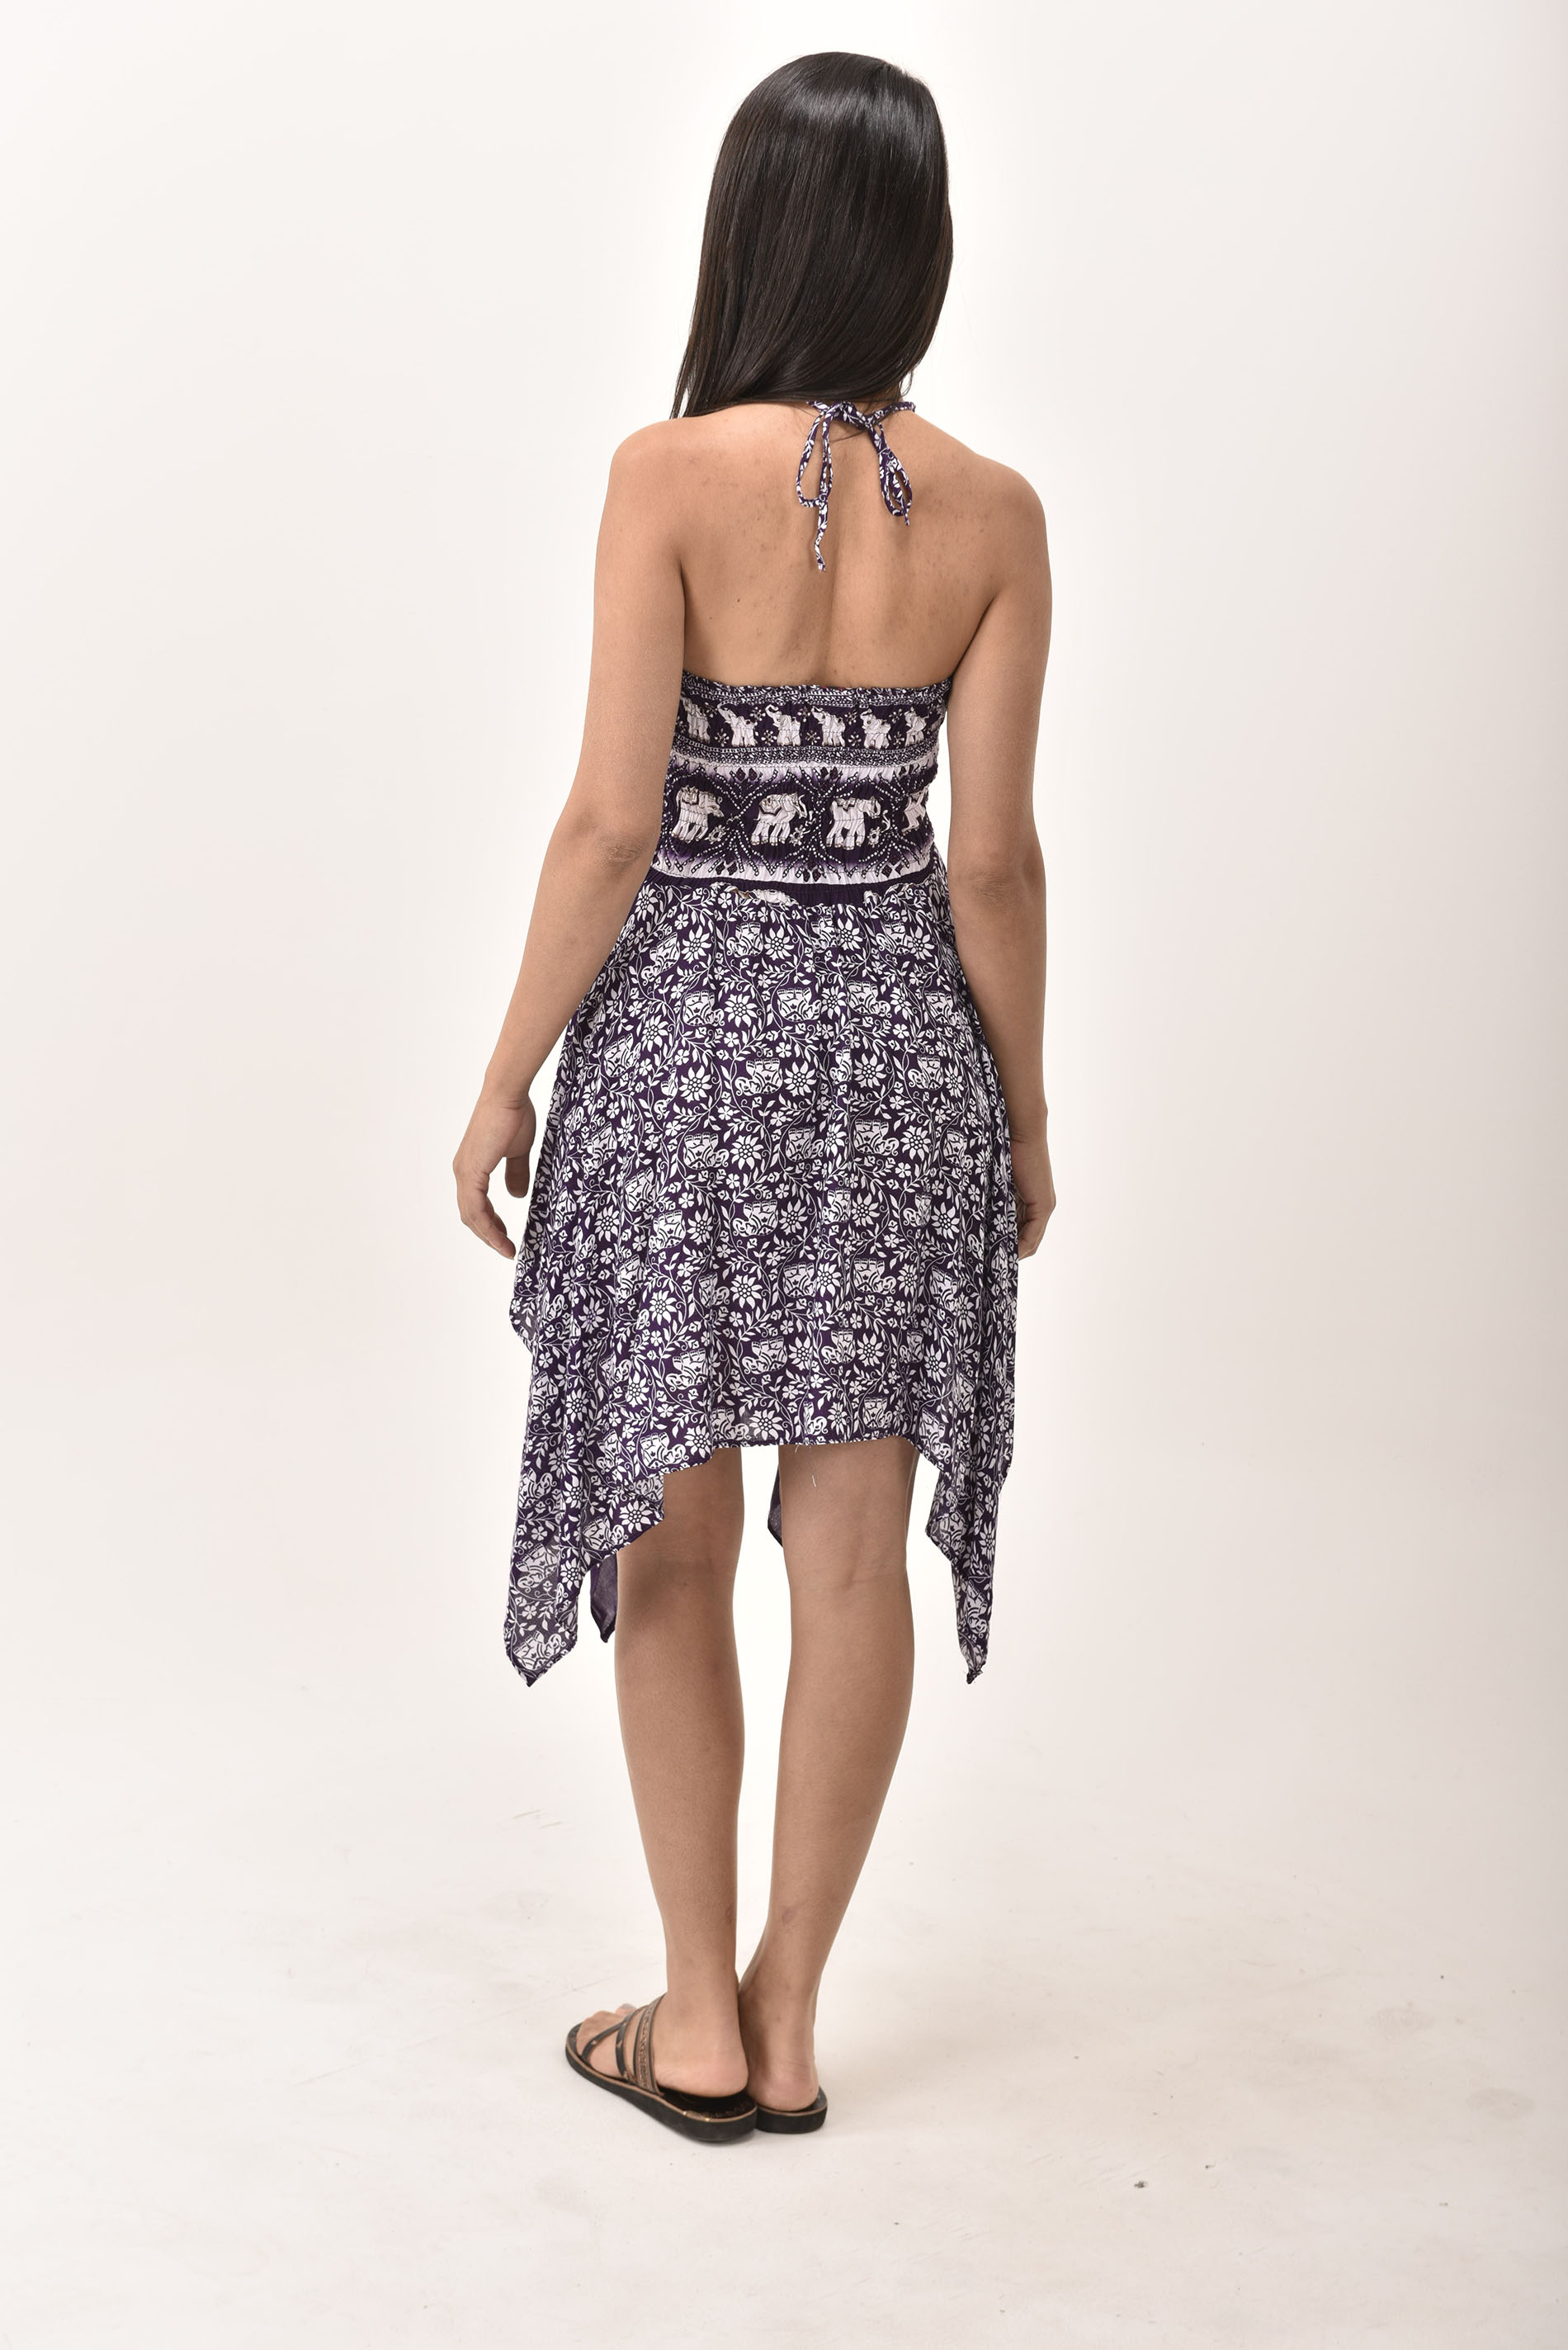 Convertible Fairy Dress / Skirt, Elephant Print, Purple